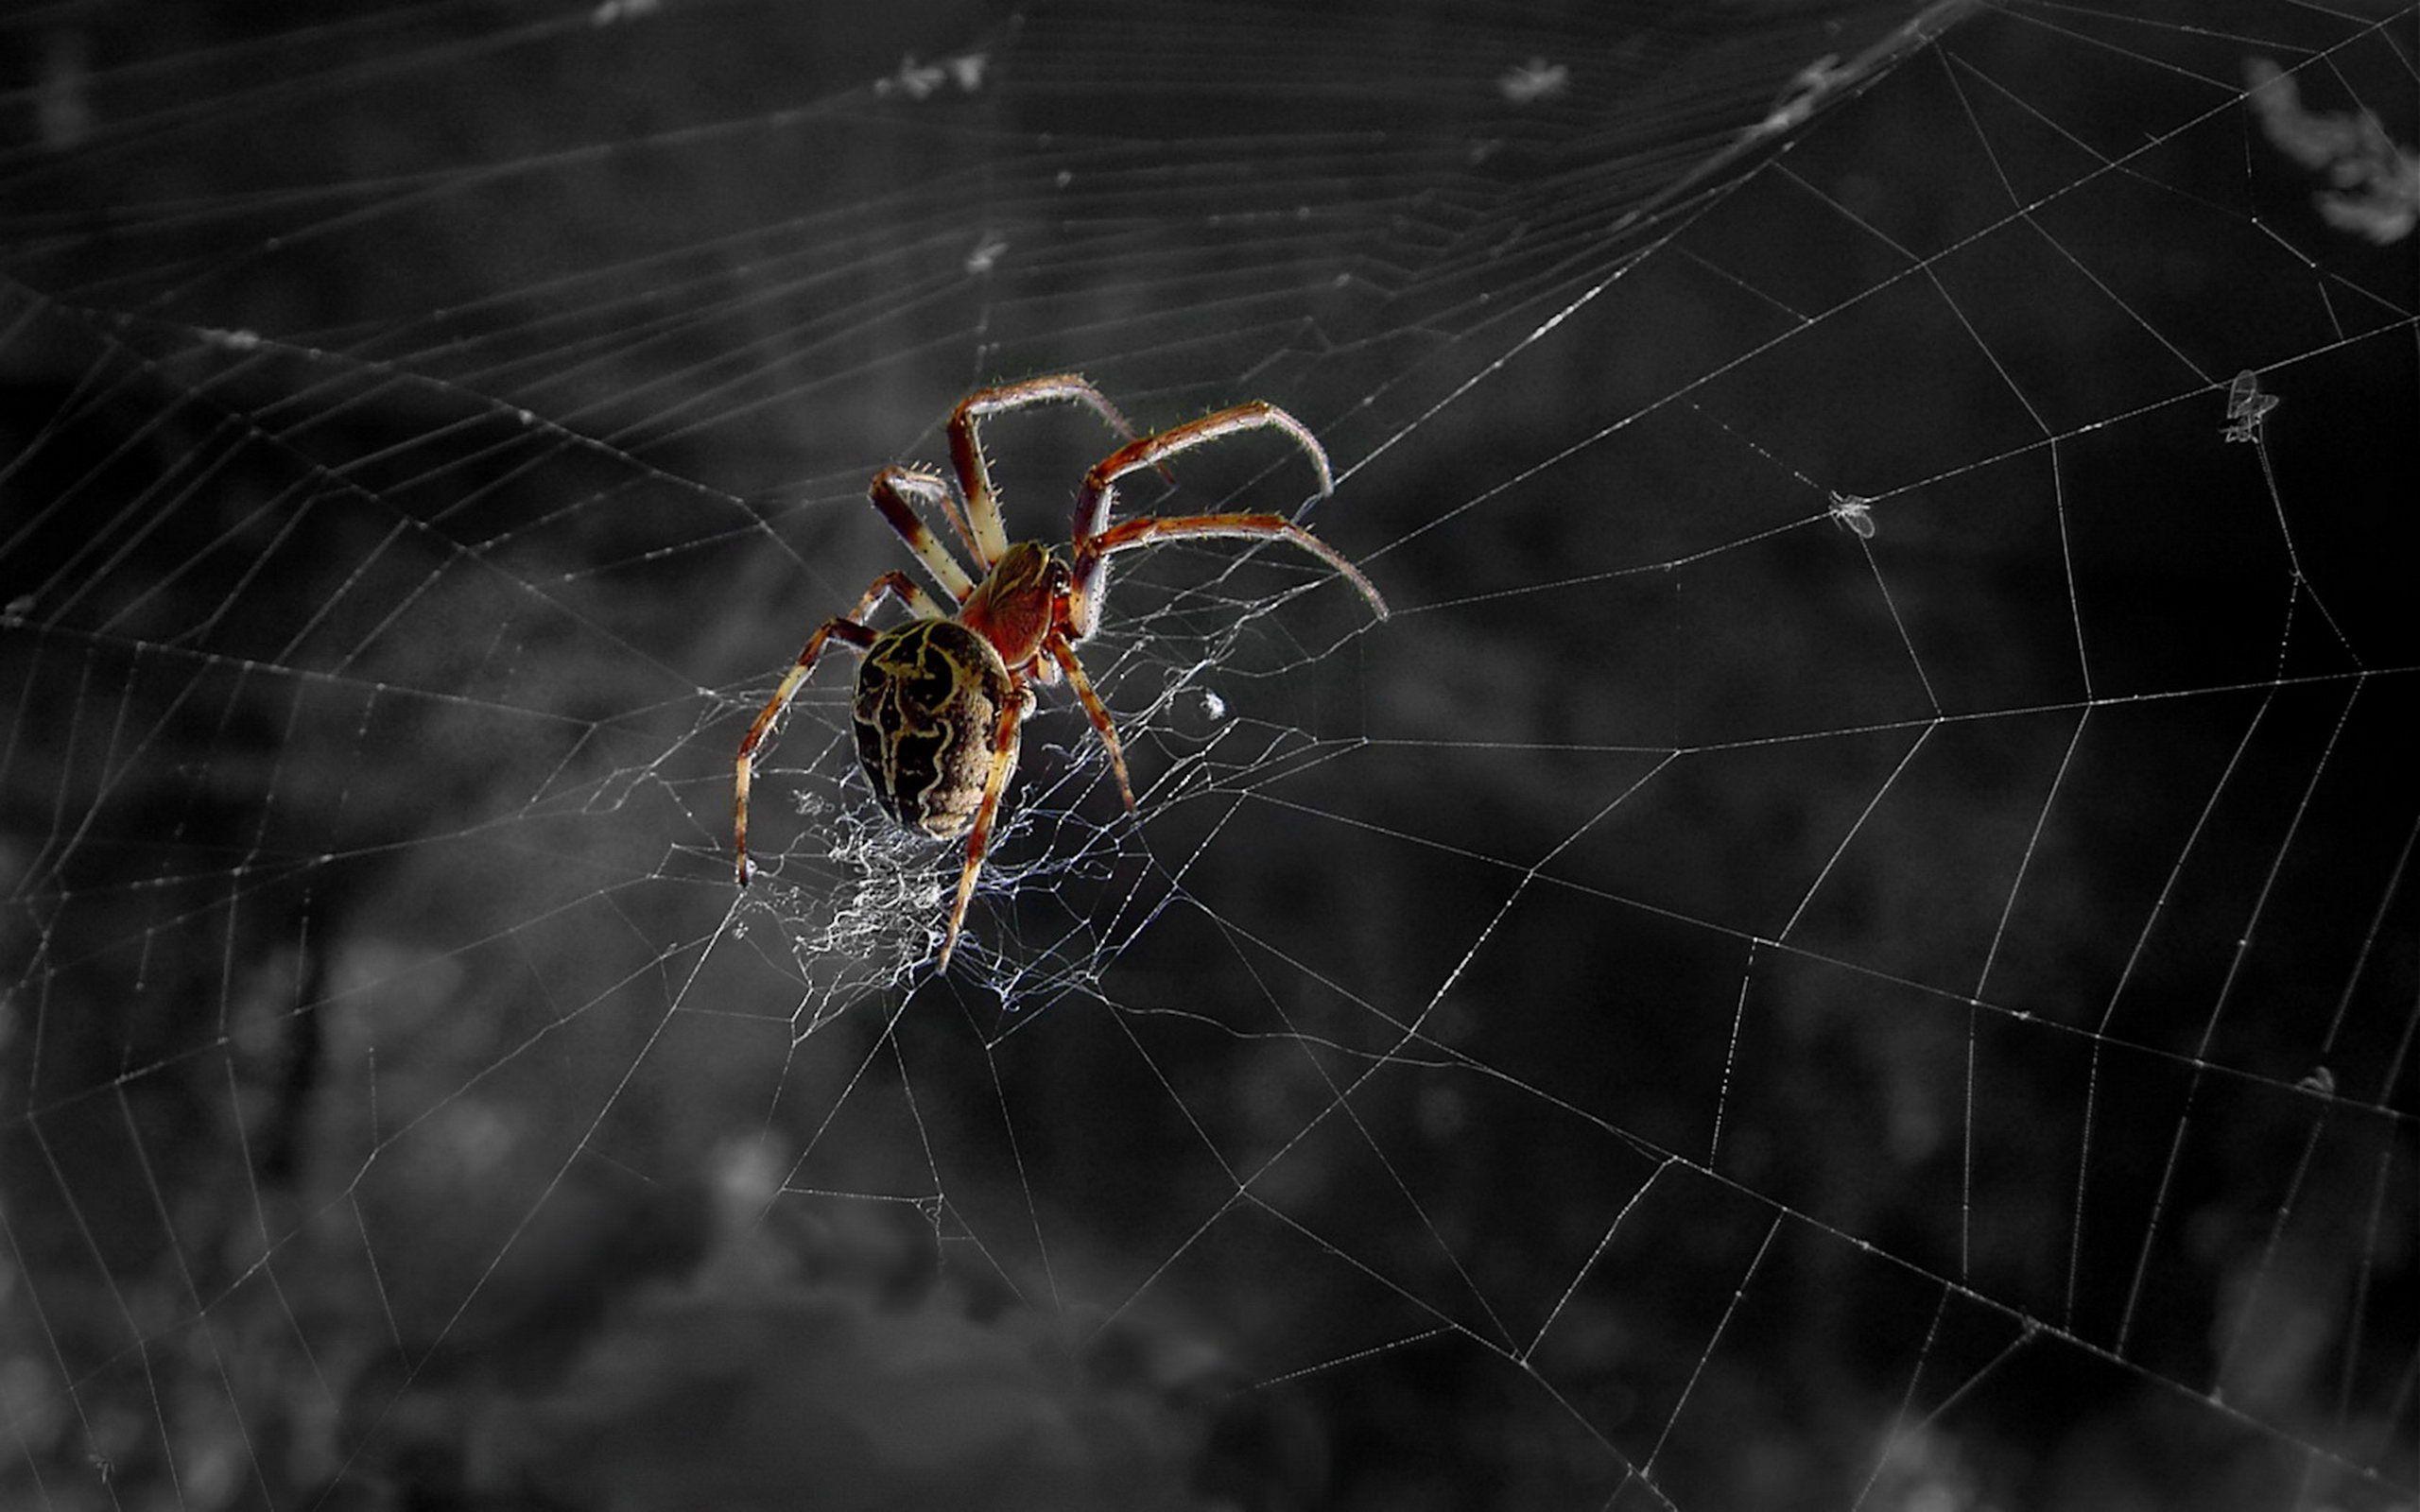 Wallpaper Quotes Iphone 6 Plus Spider Computer Wallpapers Desktop Backgrounds